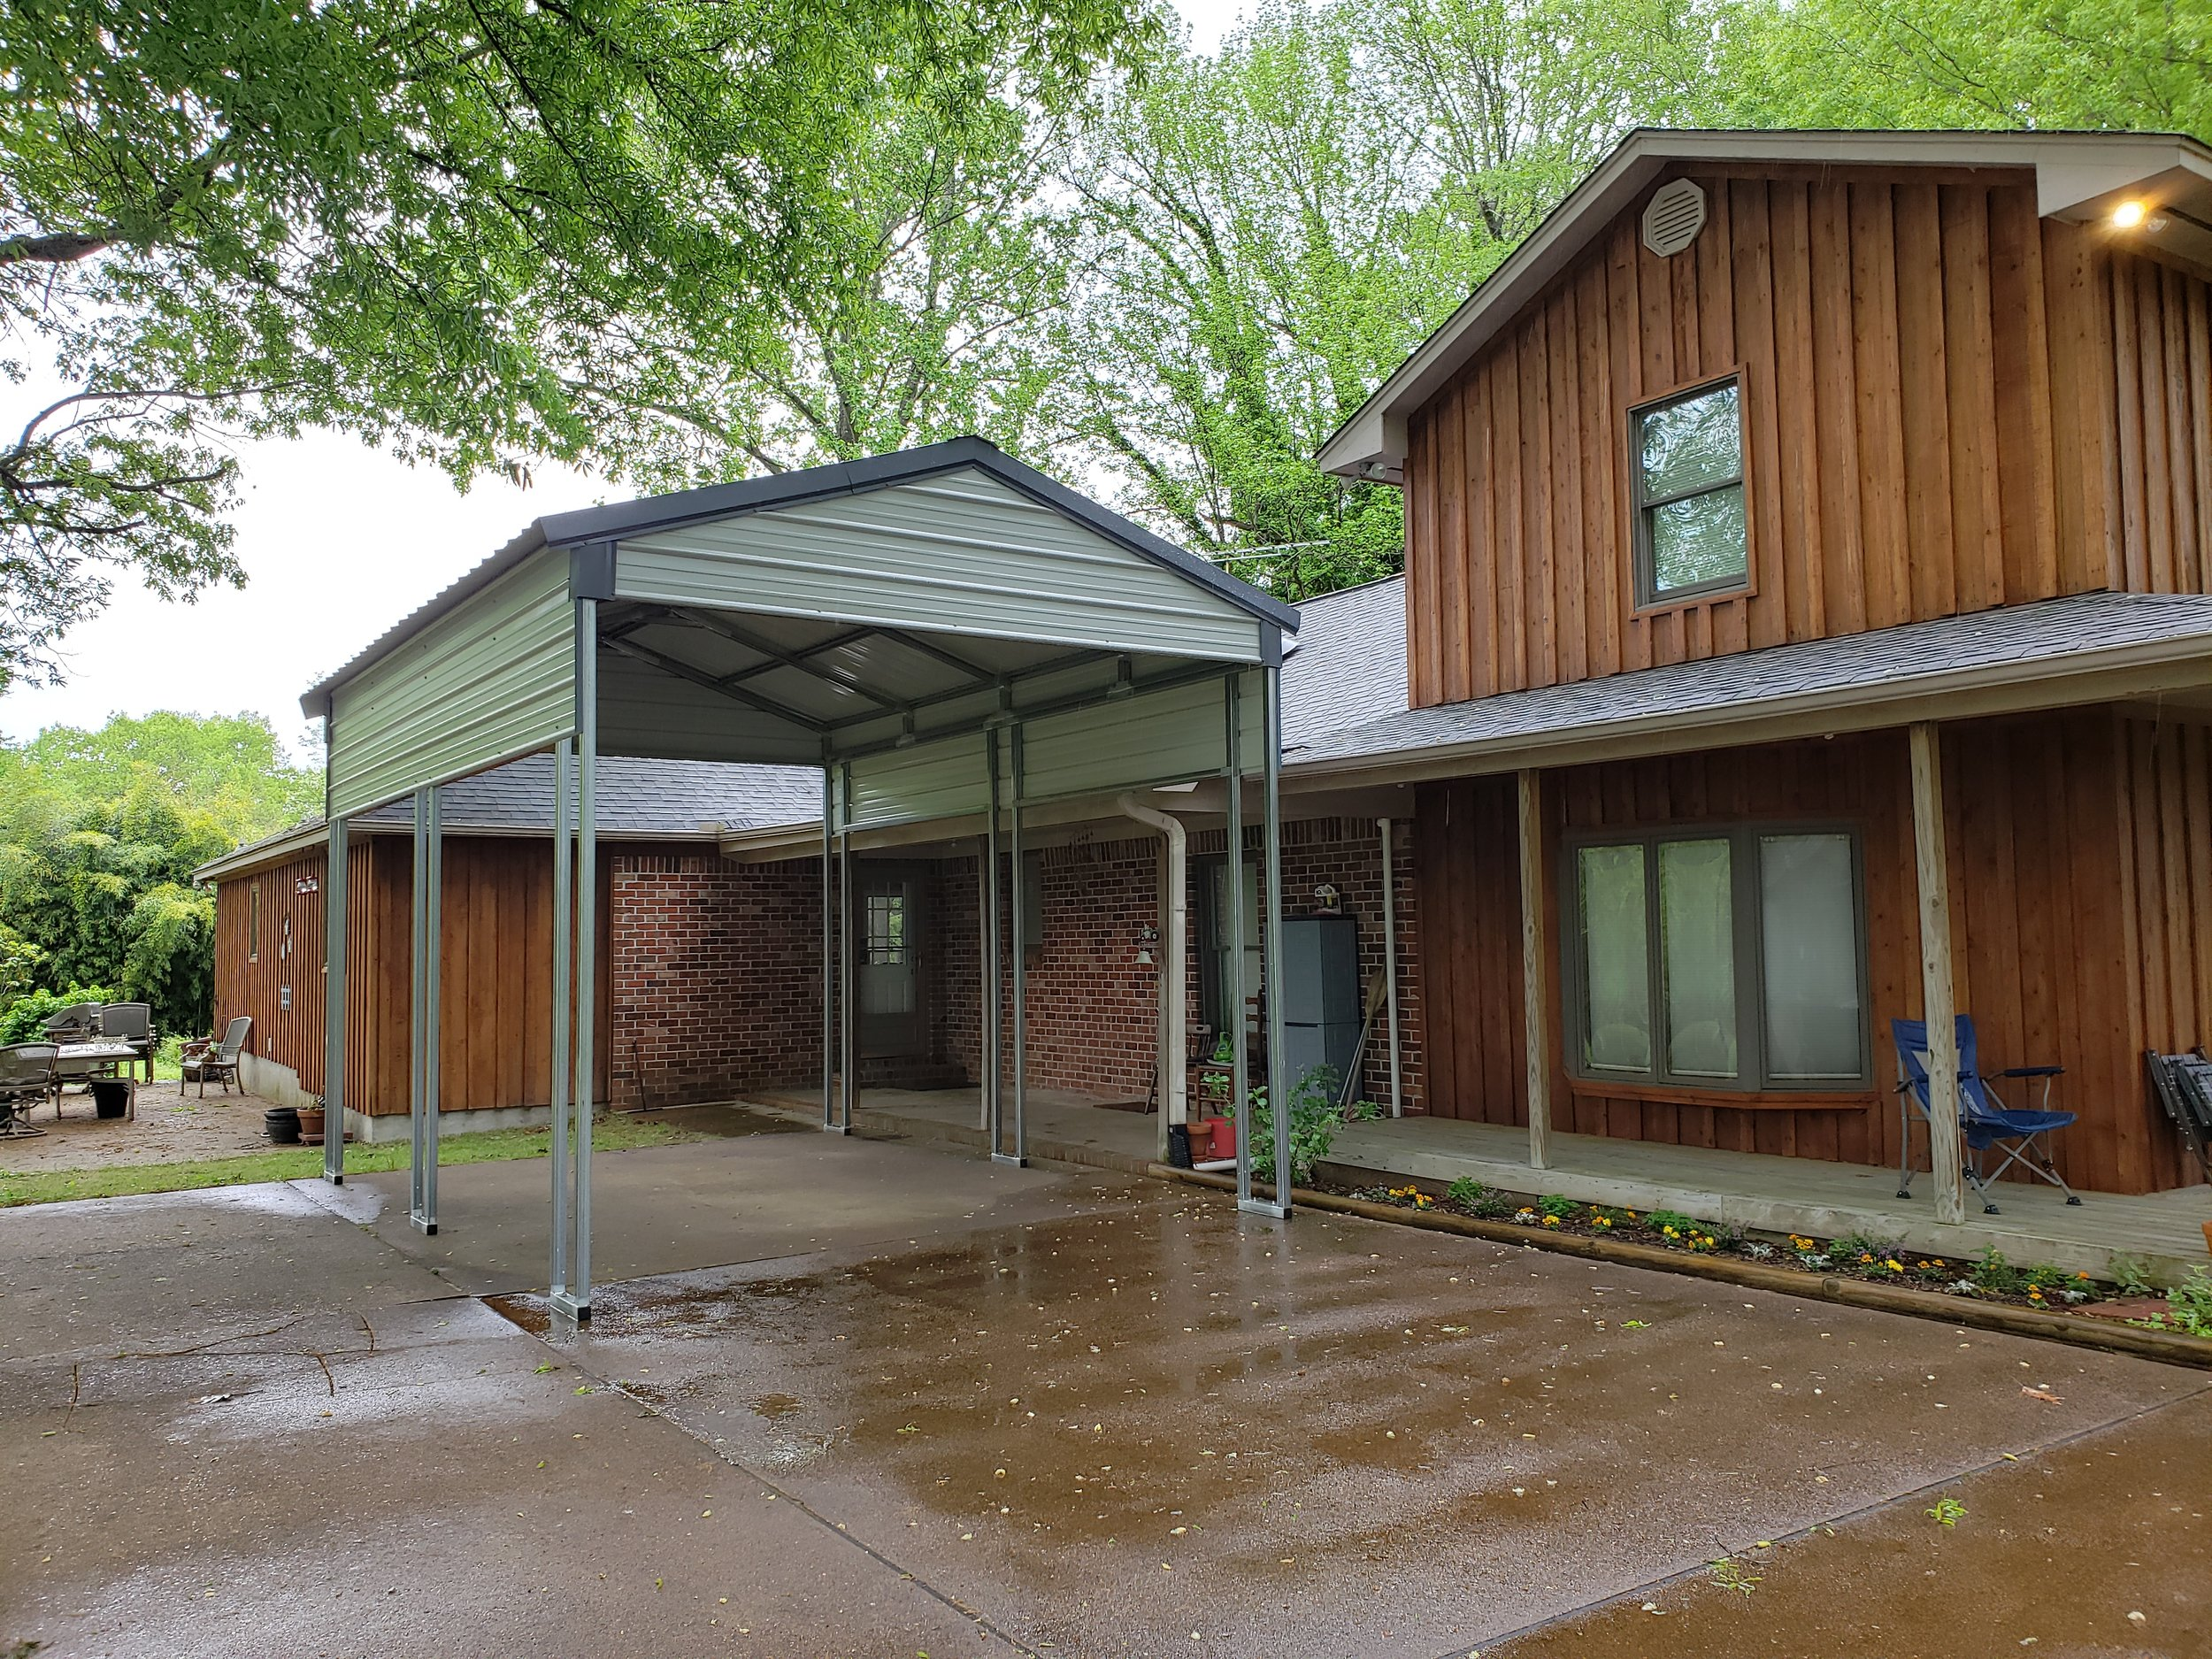 CARPORTS — shed, metal storage shed, shed, custom shed